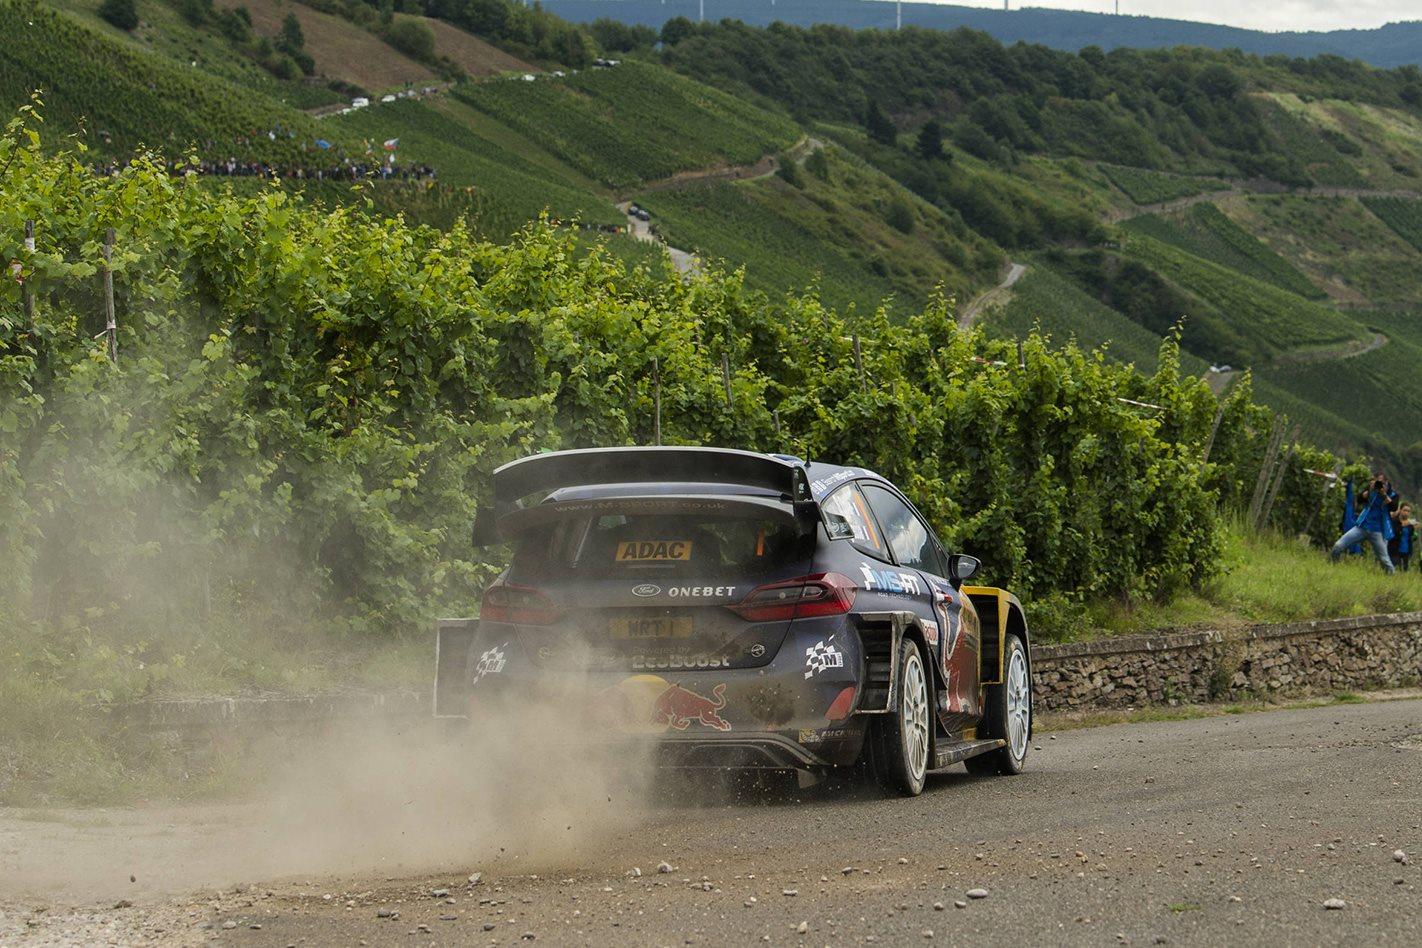 2015-Ford-Fiesta-ST-rally-rear.jpg